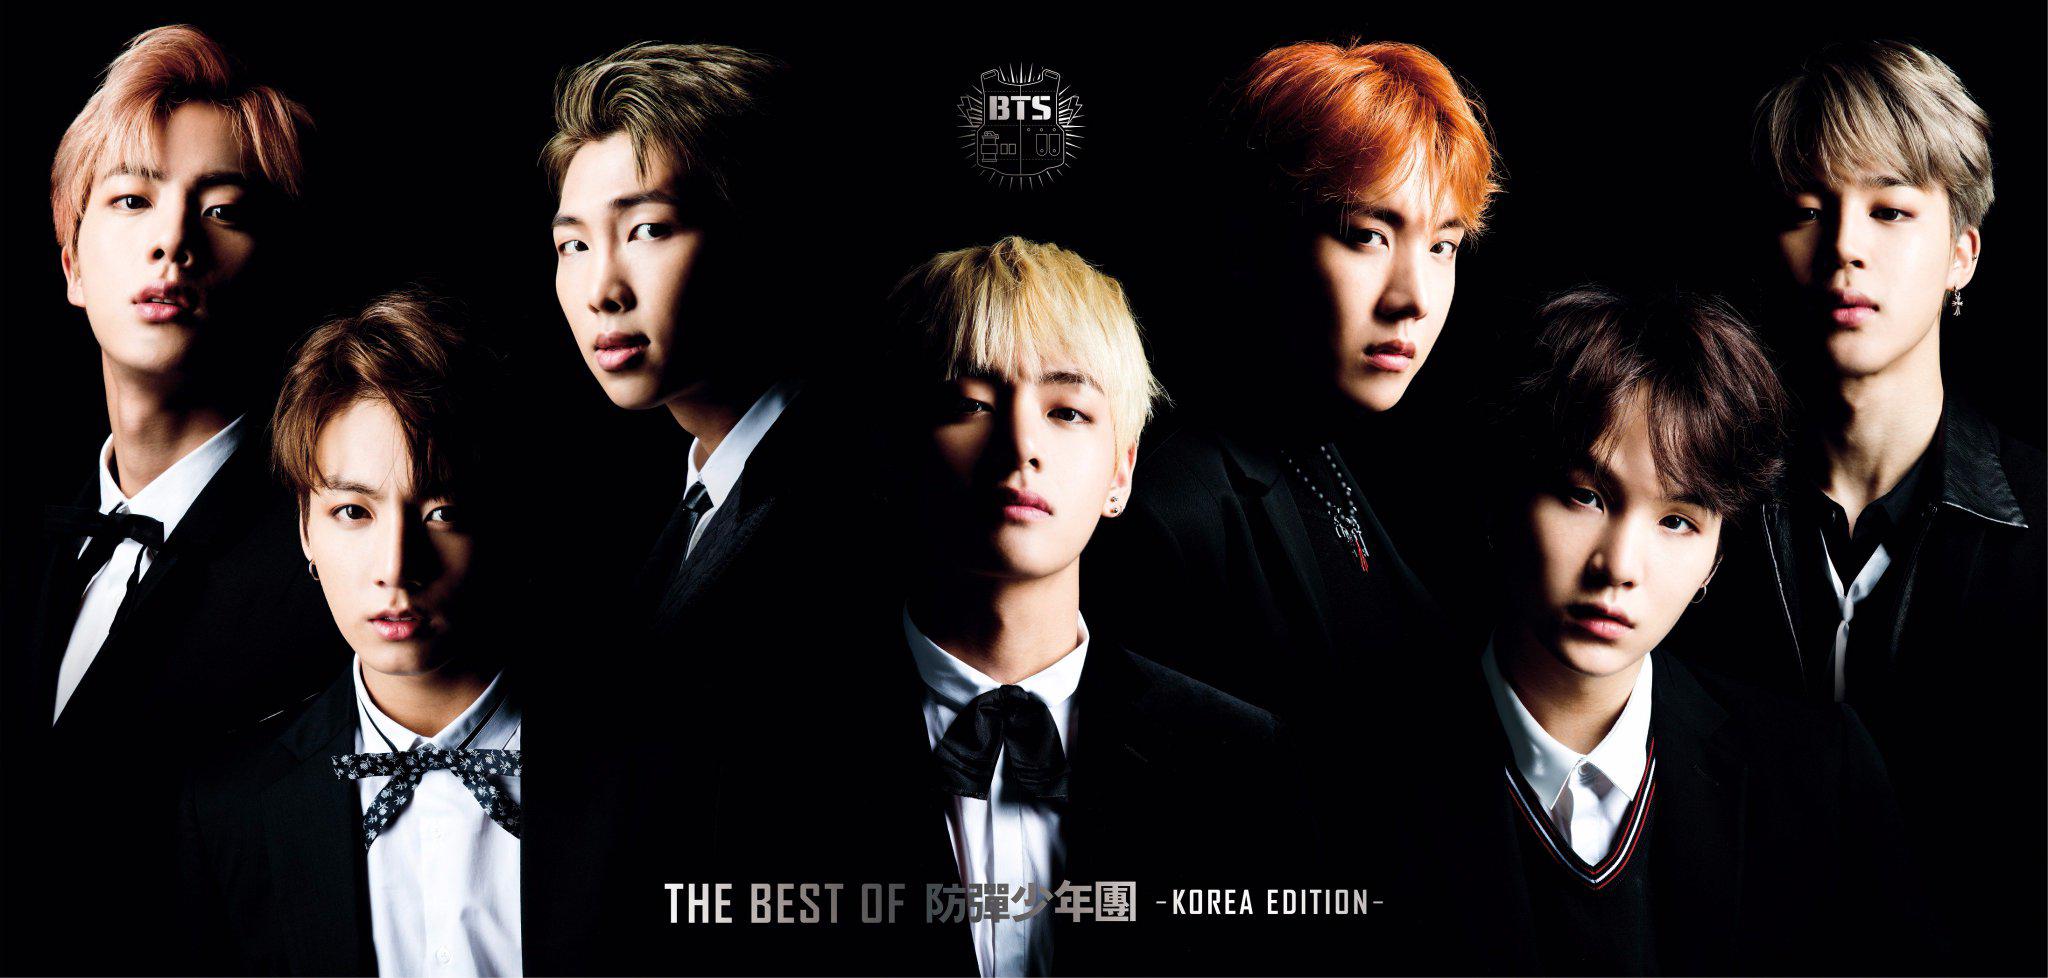 The Best of BTS: Korea Edition